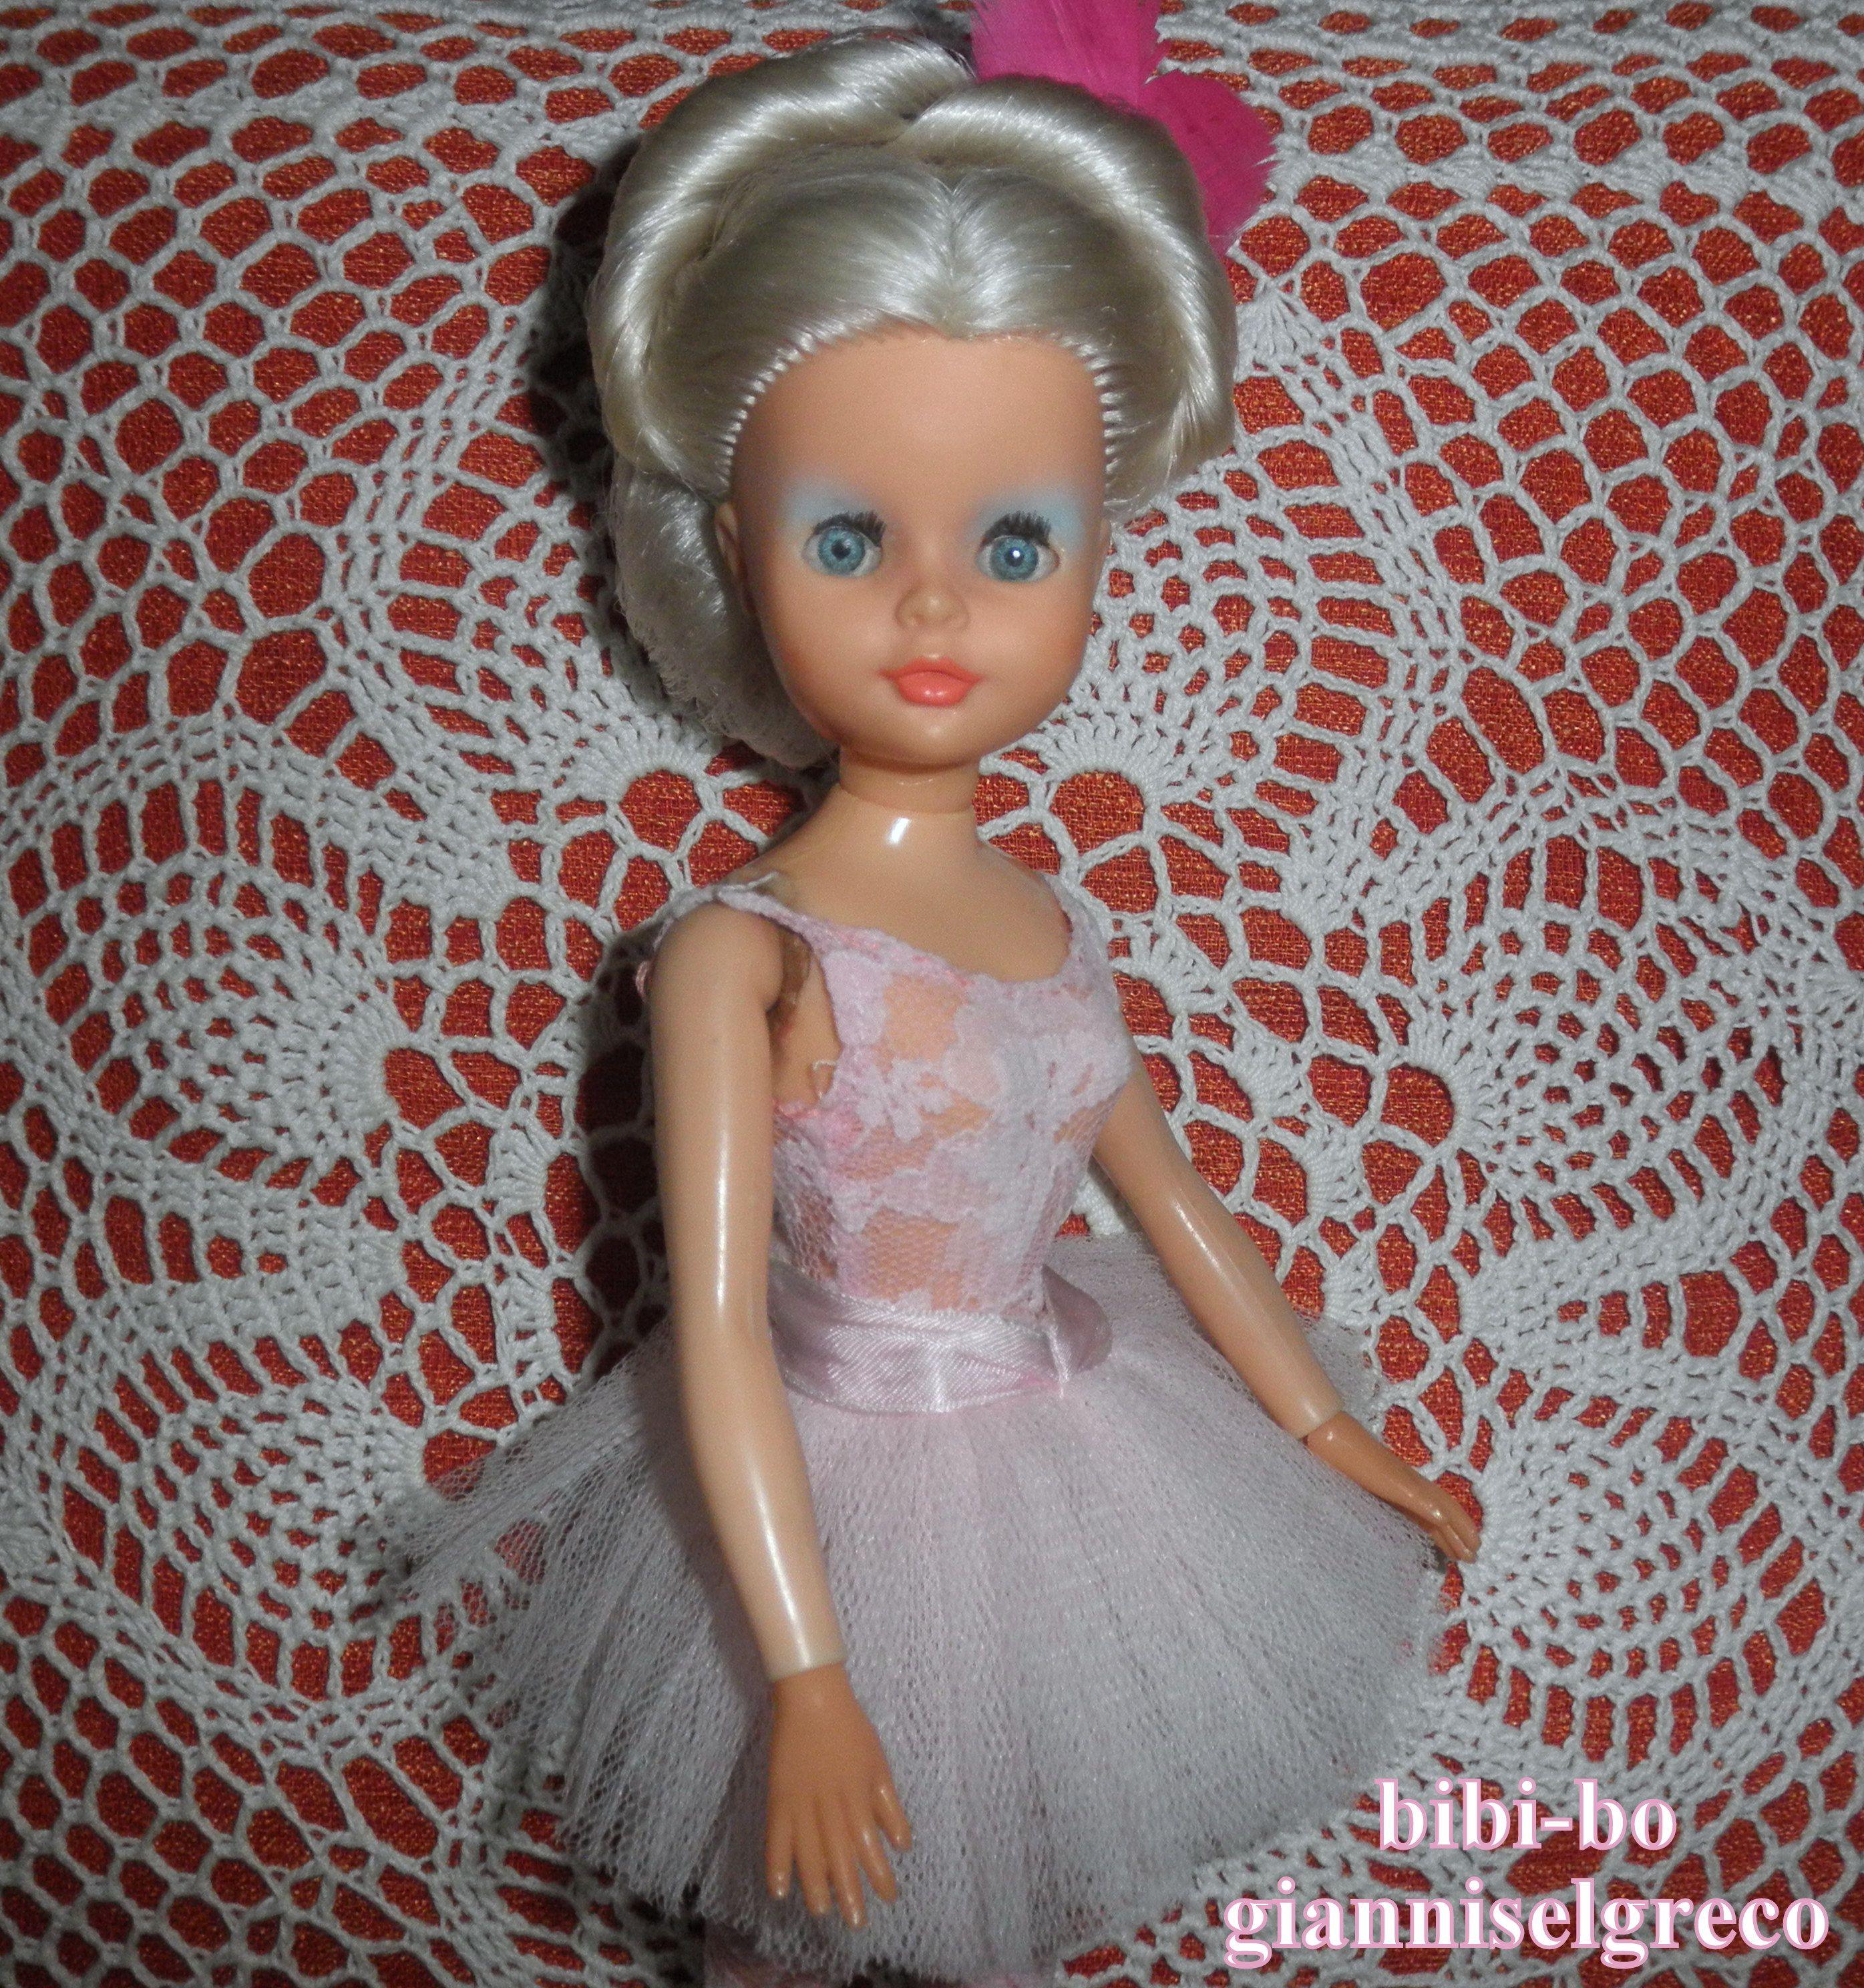 Den Bibi-bo ballerina er en af de mest elskede Bibi-bo! Den bibi-bo ballerina är en av de mest älskade bibi-bo! Den bibi-bo ballerina er en av de mest elskede bibi-bo! Bibi-bo ballerina on yksi rakastetuimmista Bibi-bo!